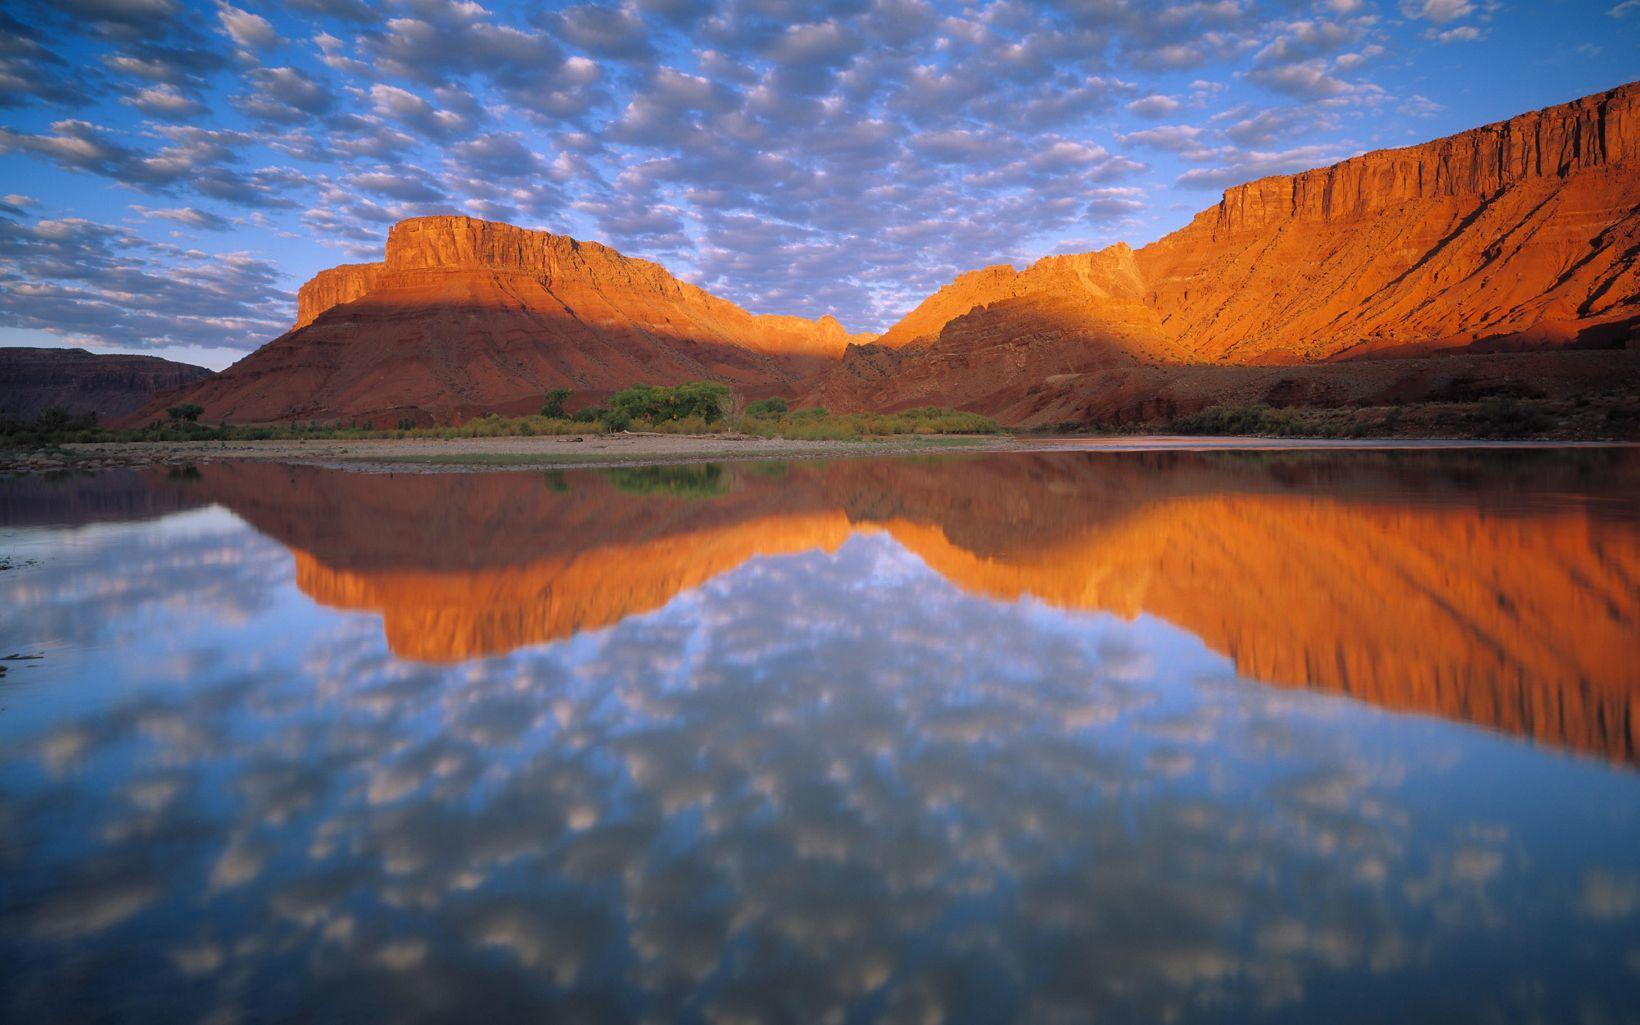 Buttermilk Clouds above Colorado River at Sorrel River Ranch in Utah.